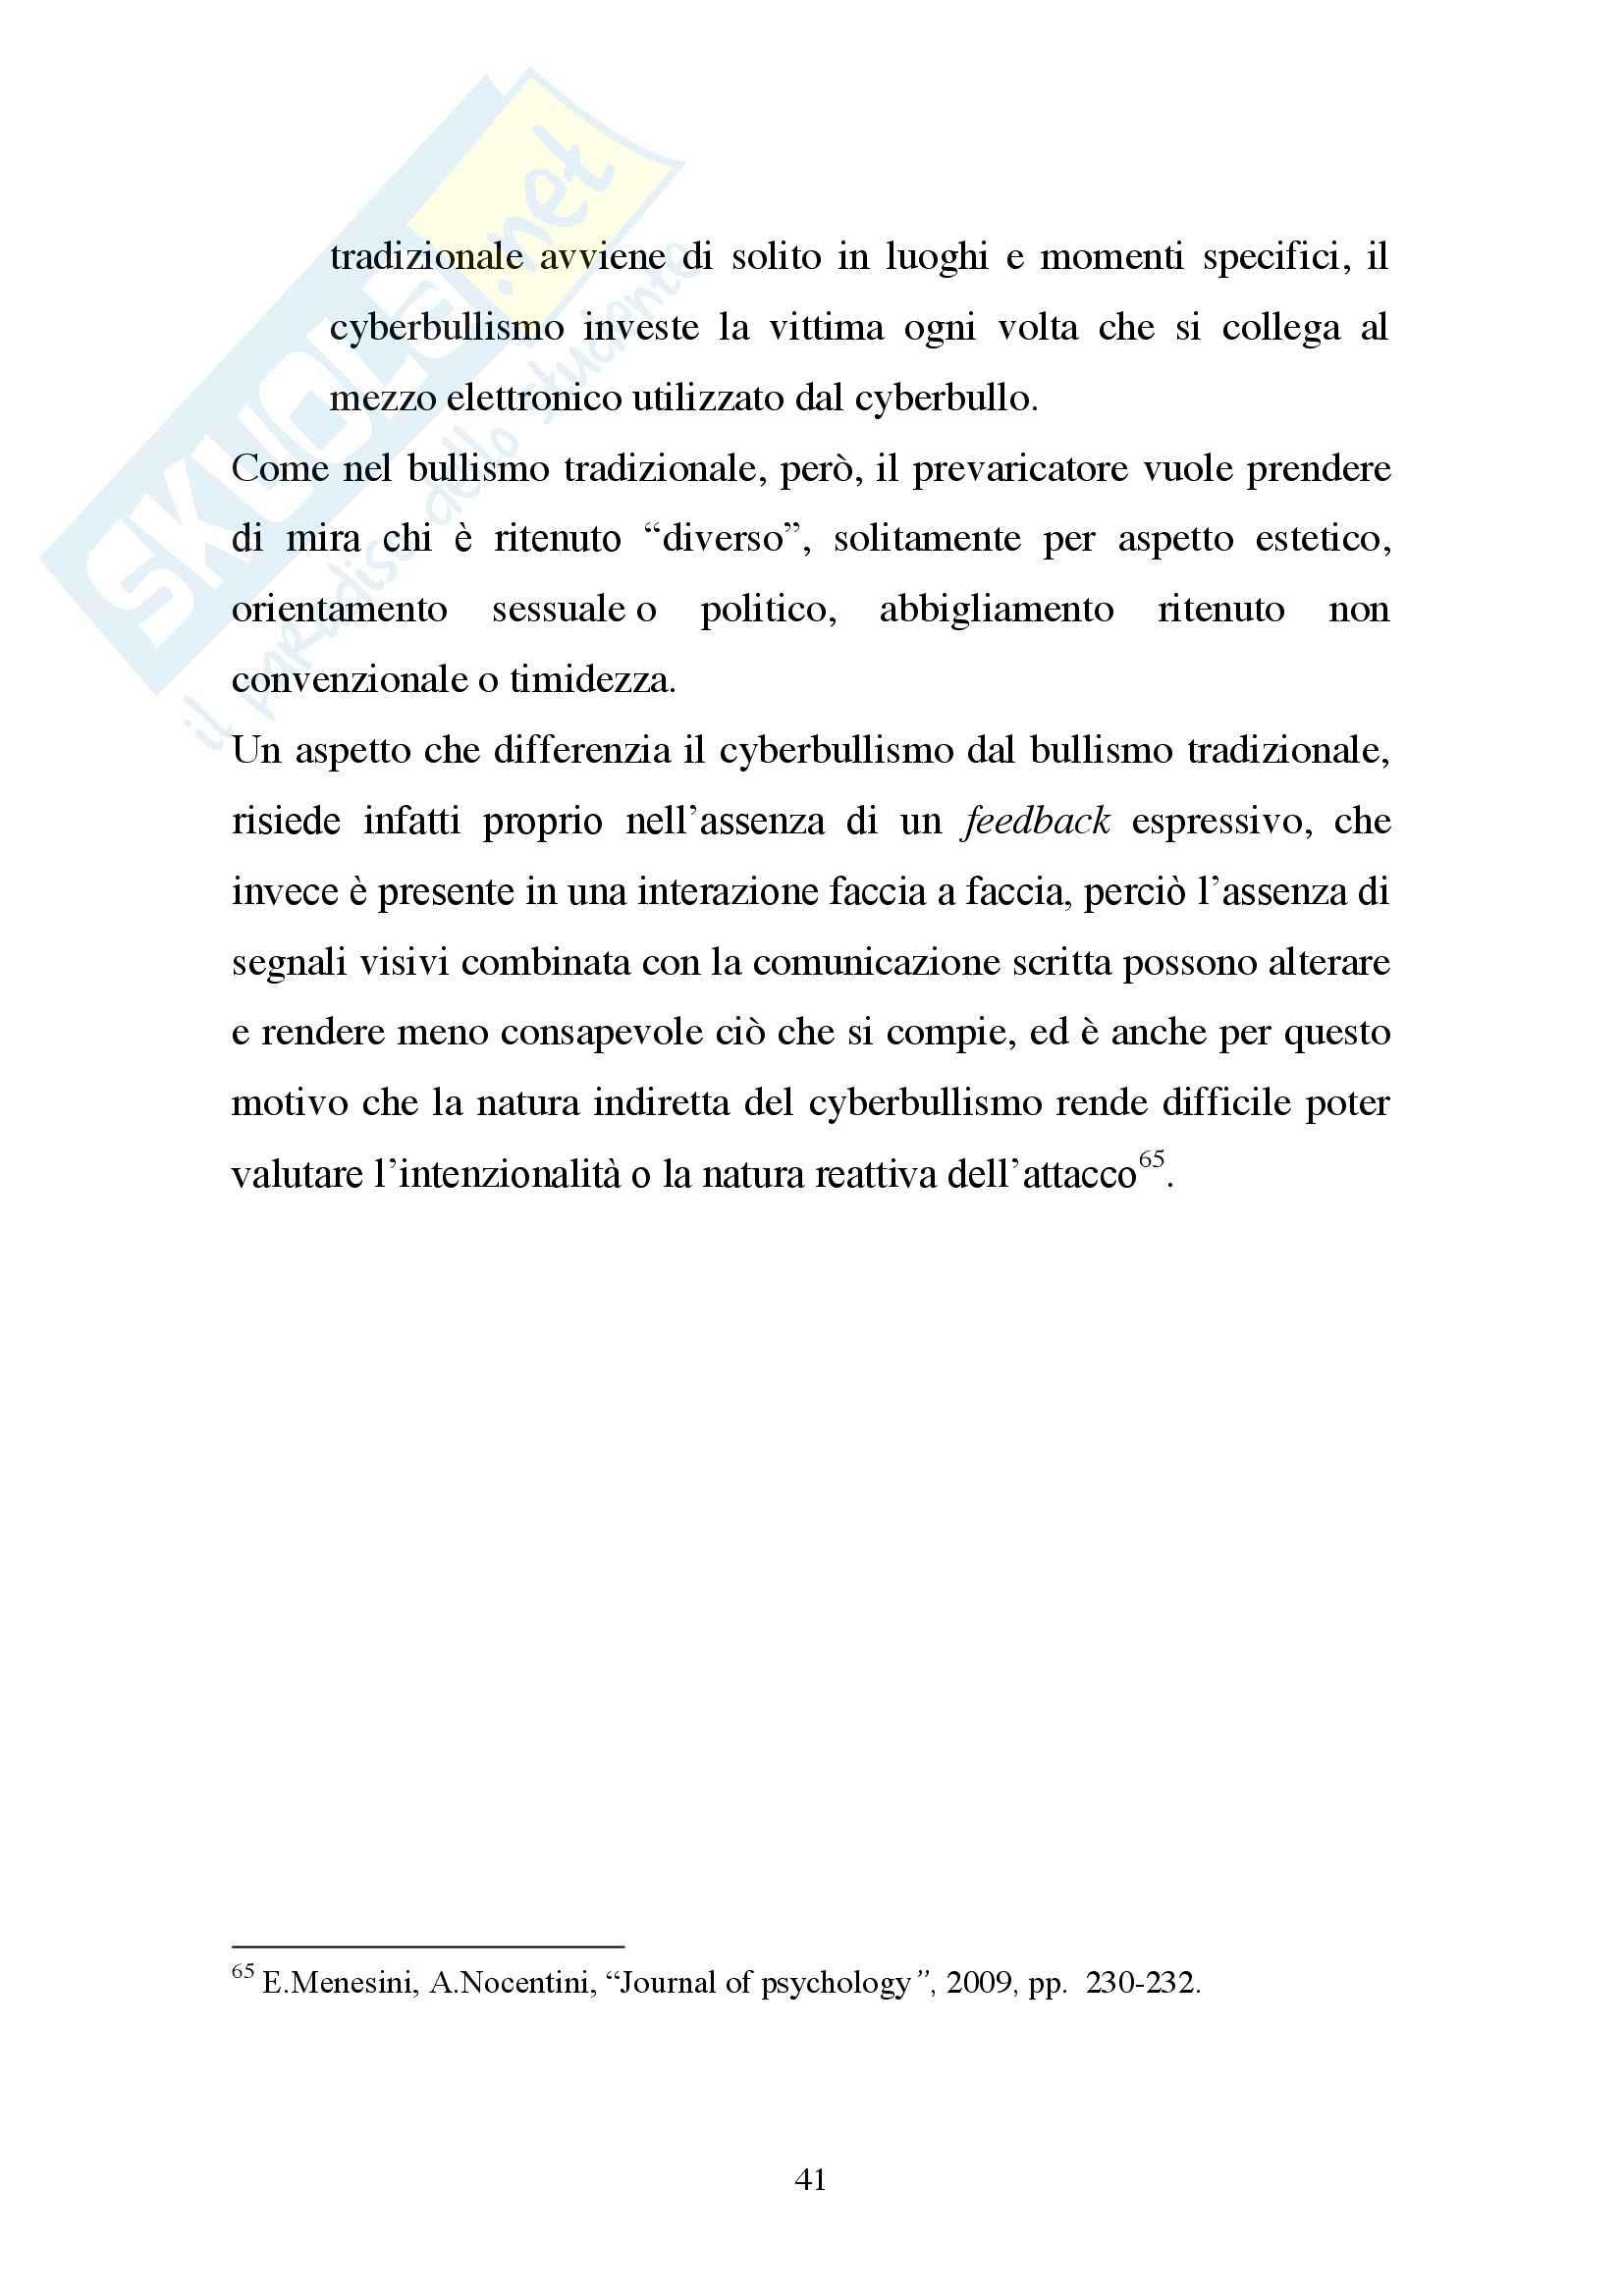 Cyberbullismo, Criminologia Pag. 41